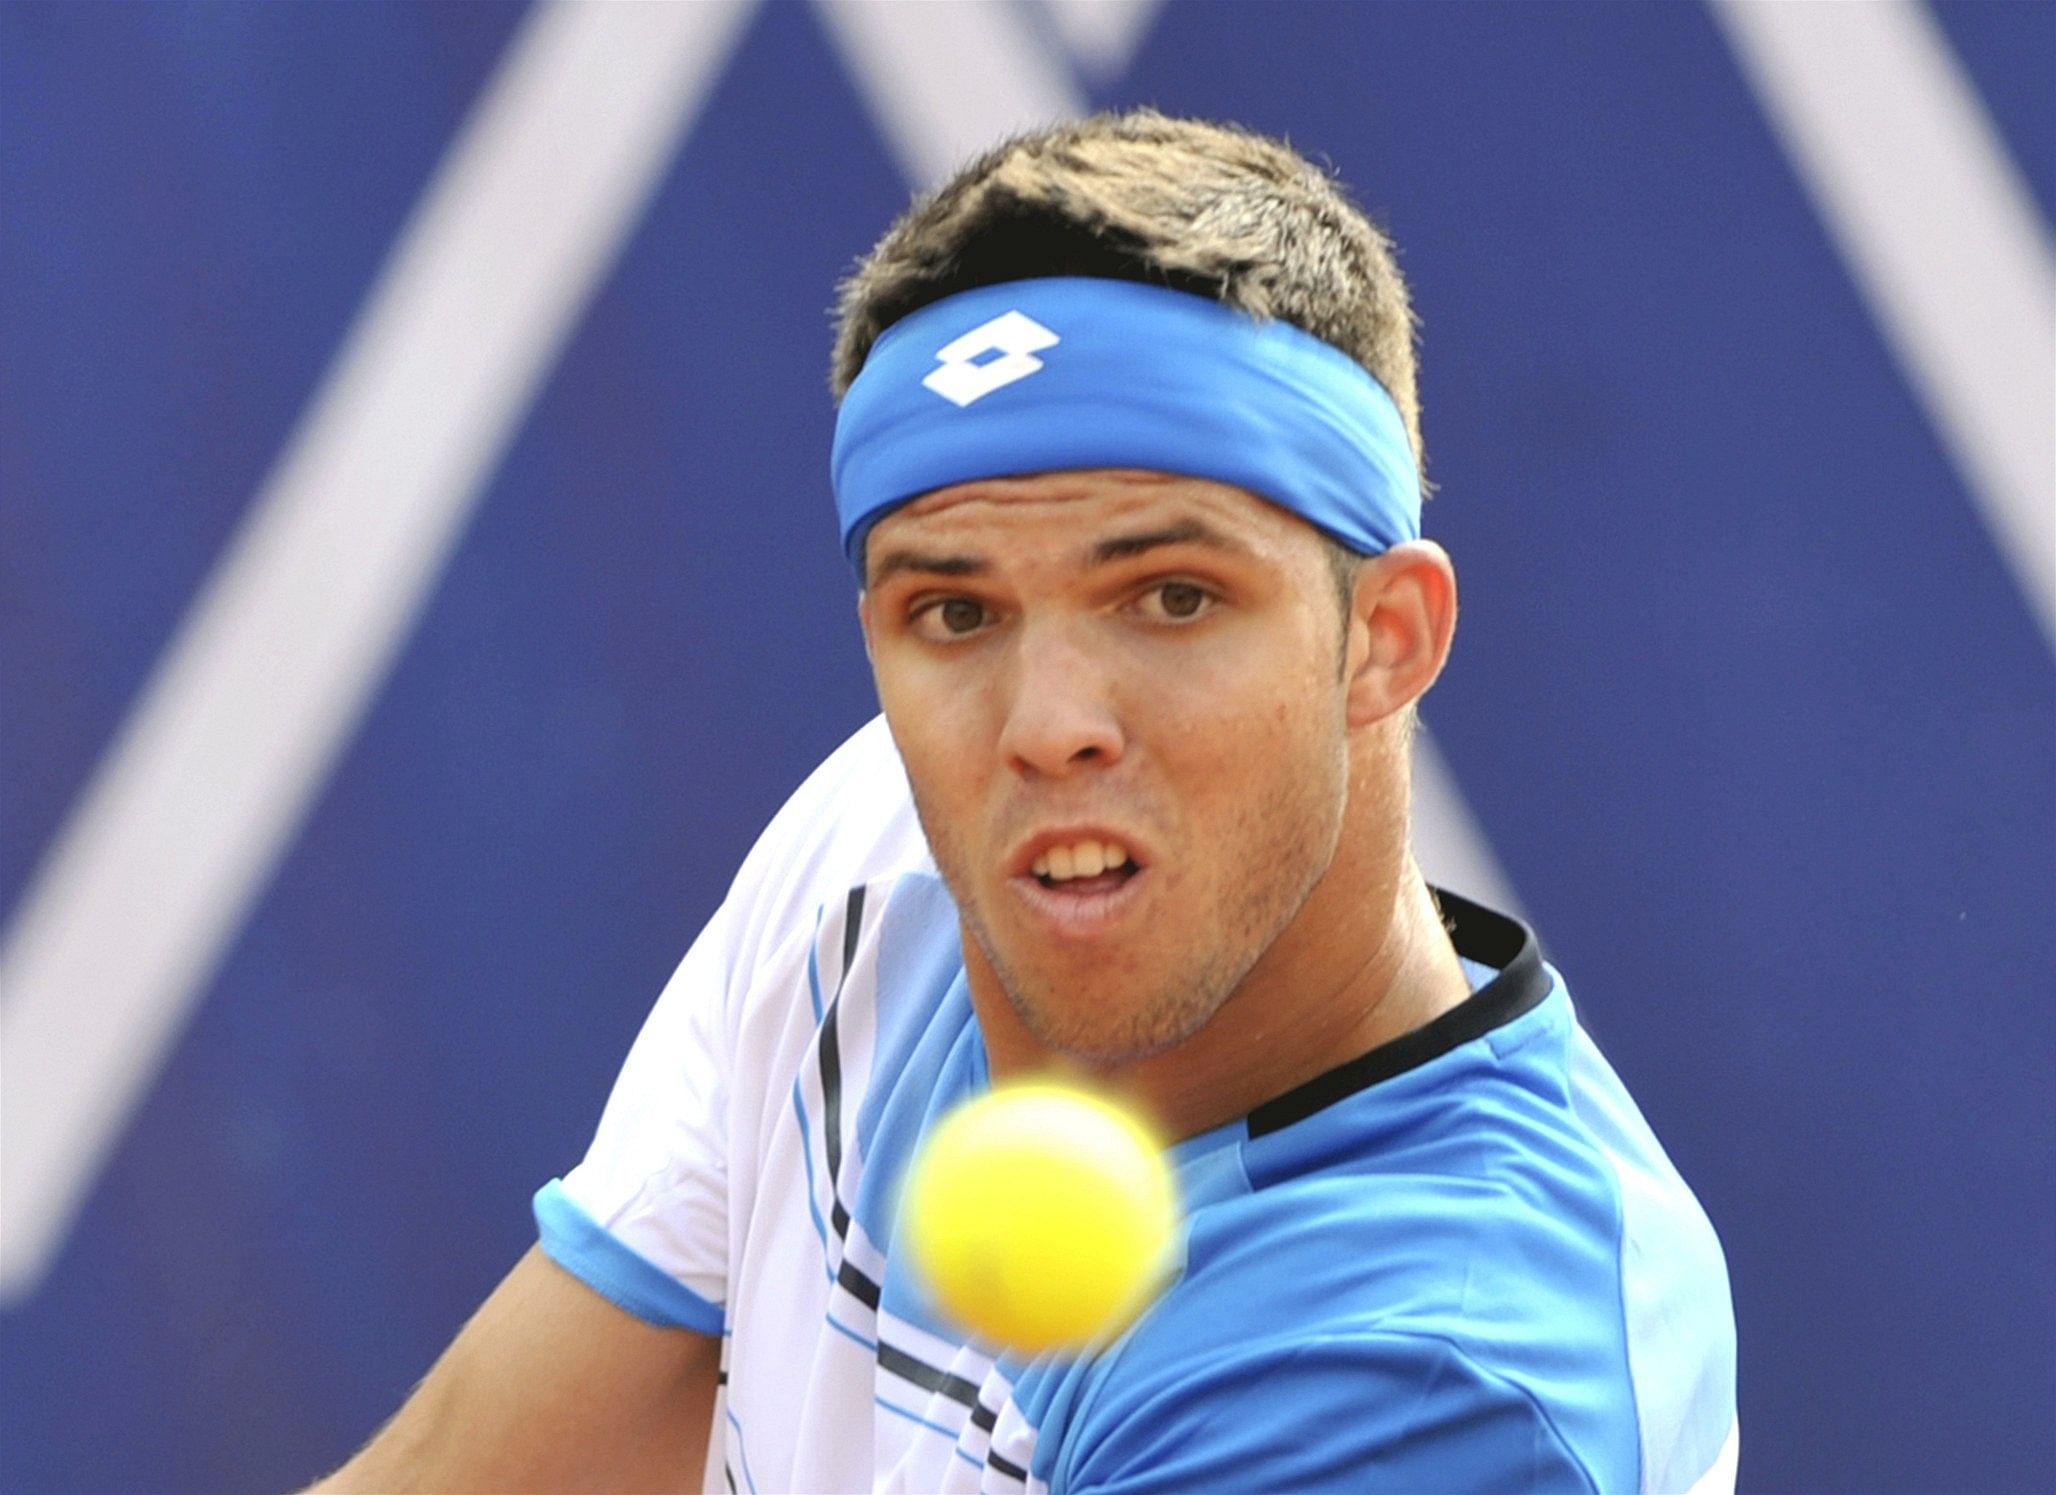 Czech Republic beat Australia in Davis Cup doubles